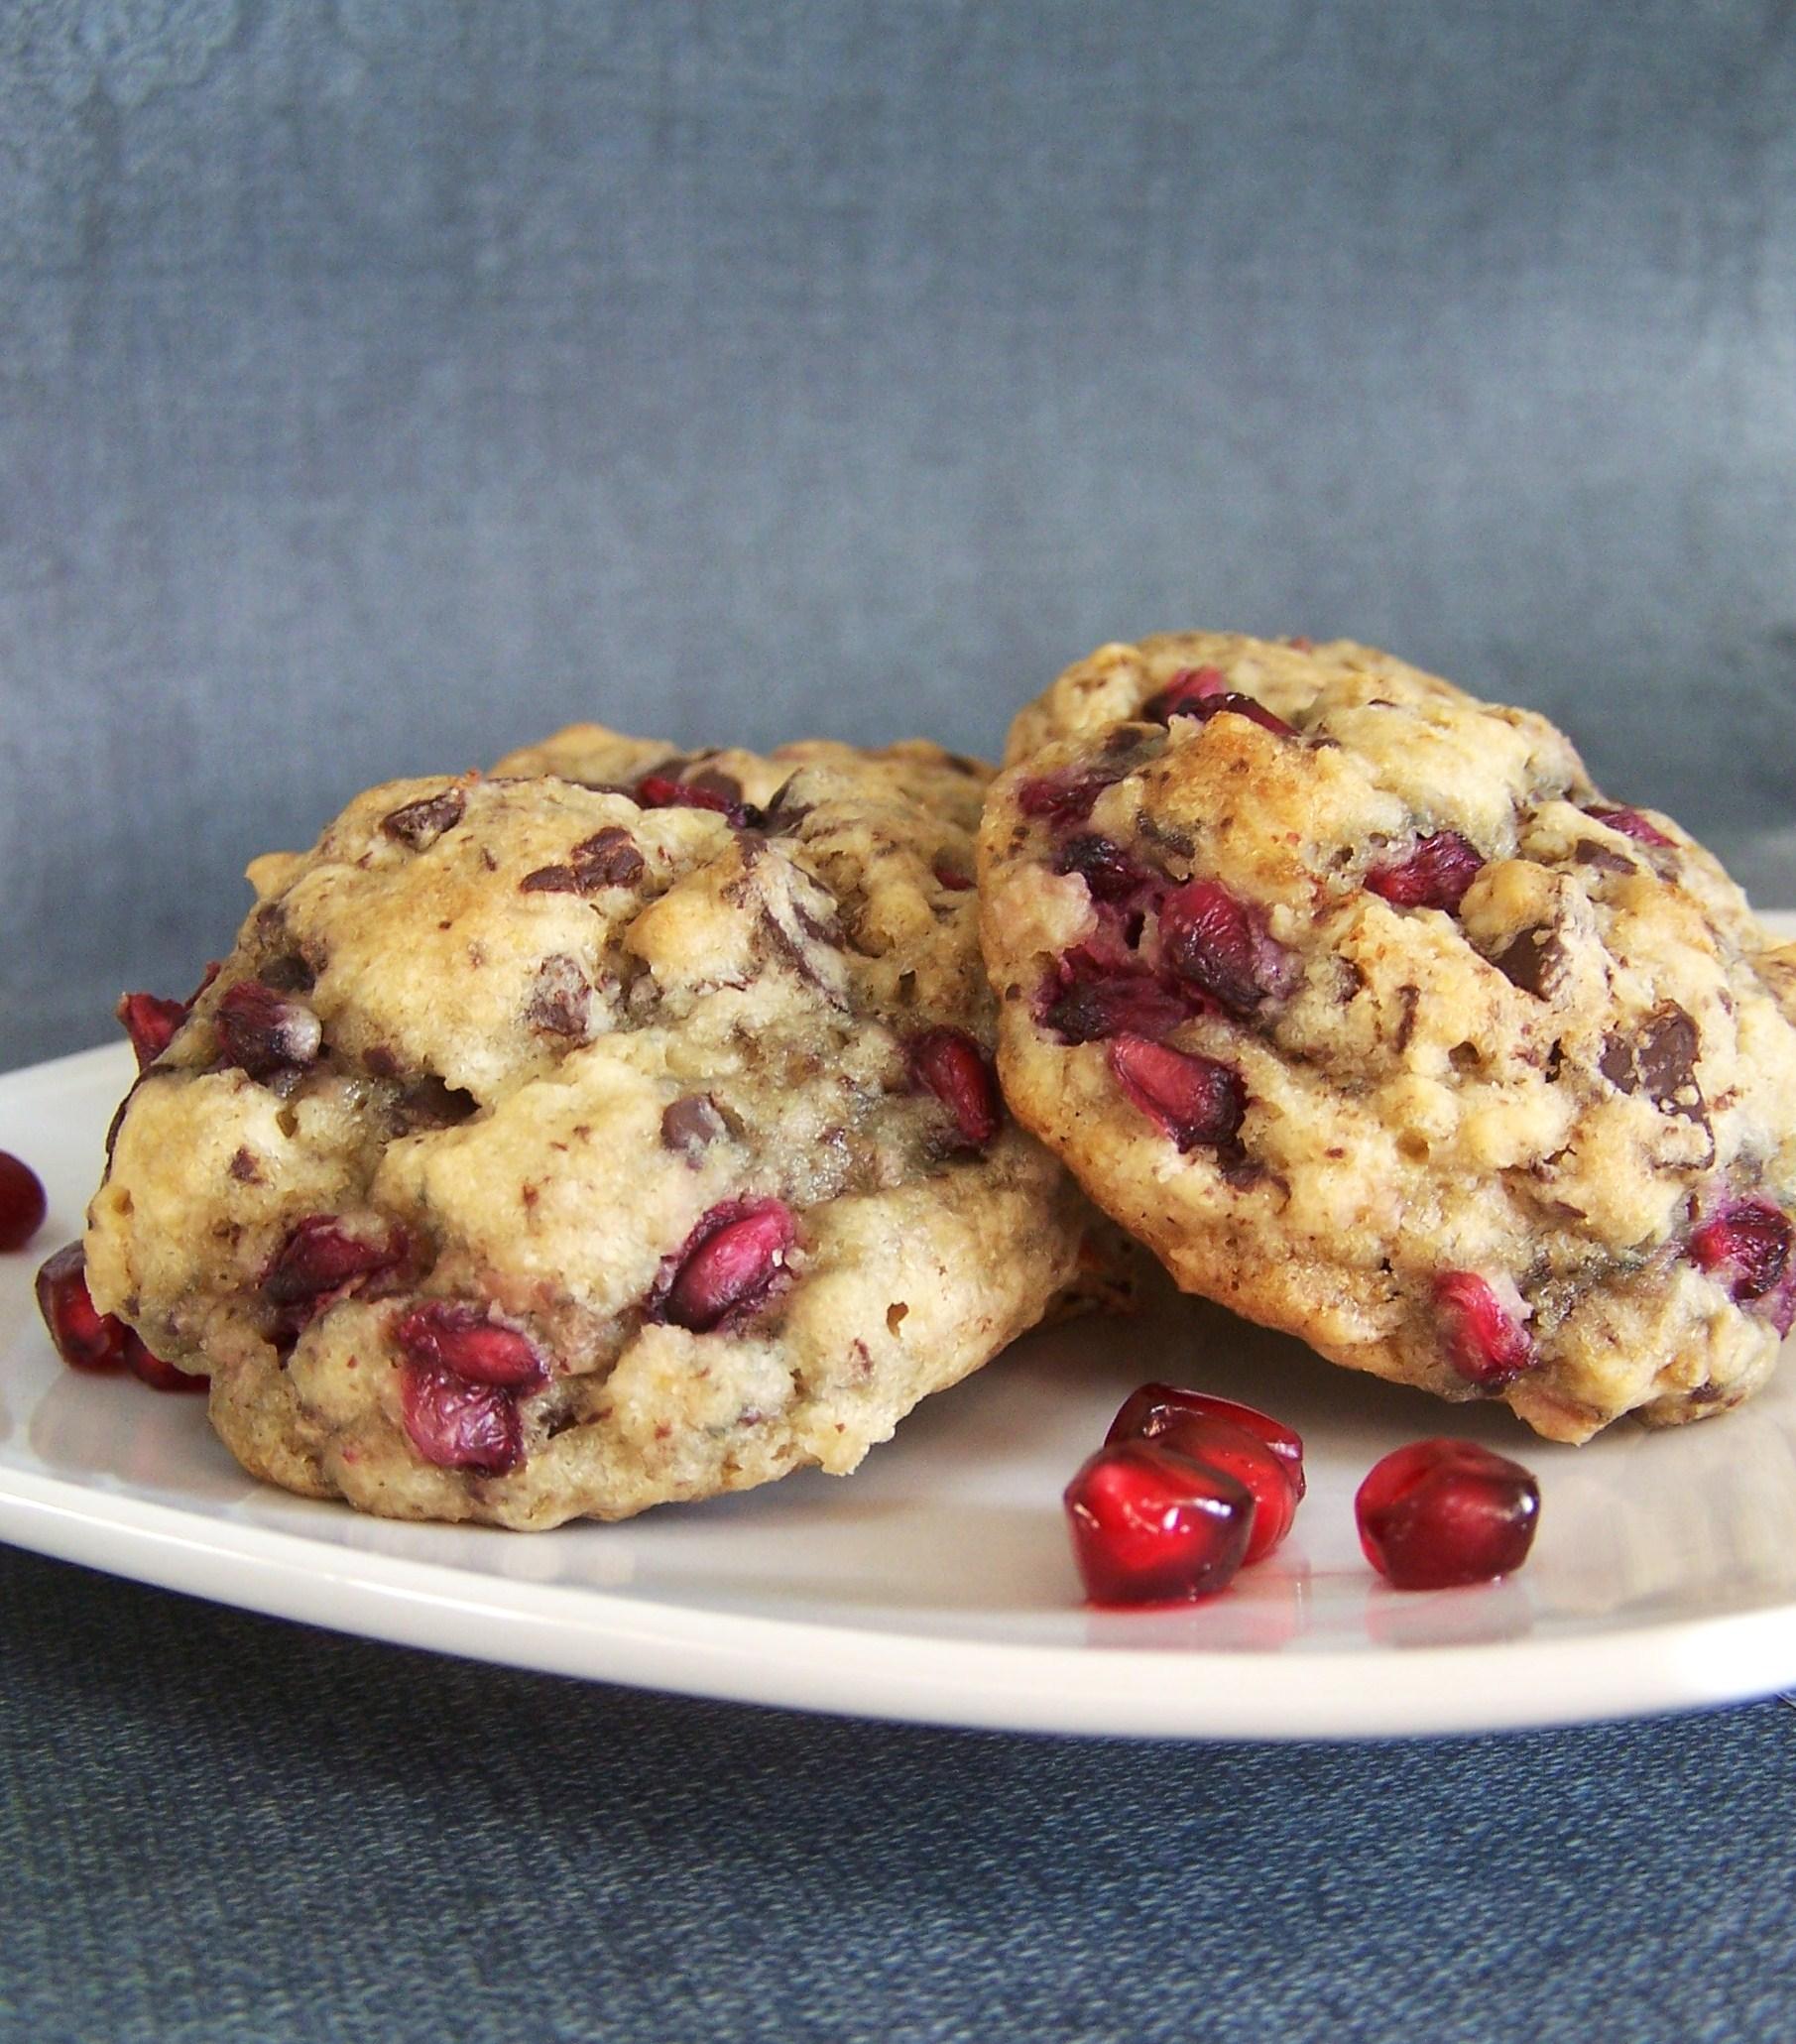 Pomegranate Chocolate Chunk Oatmeal Cookies